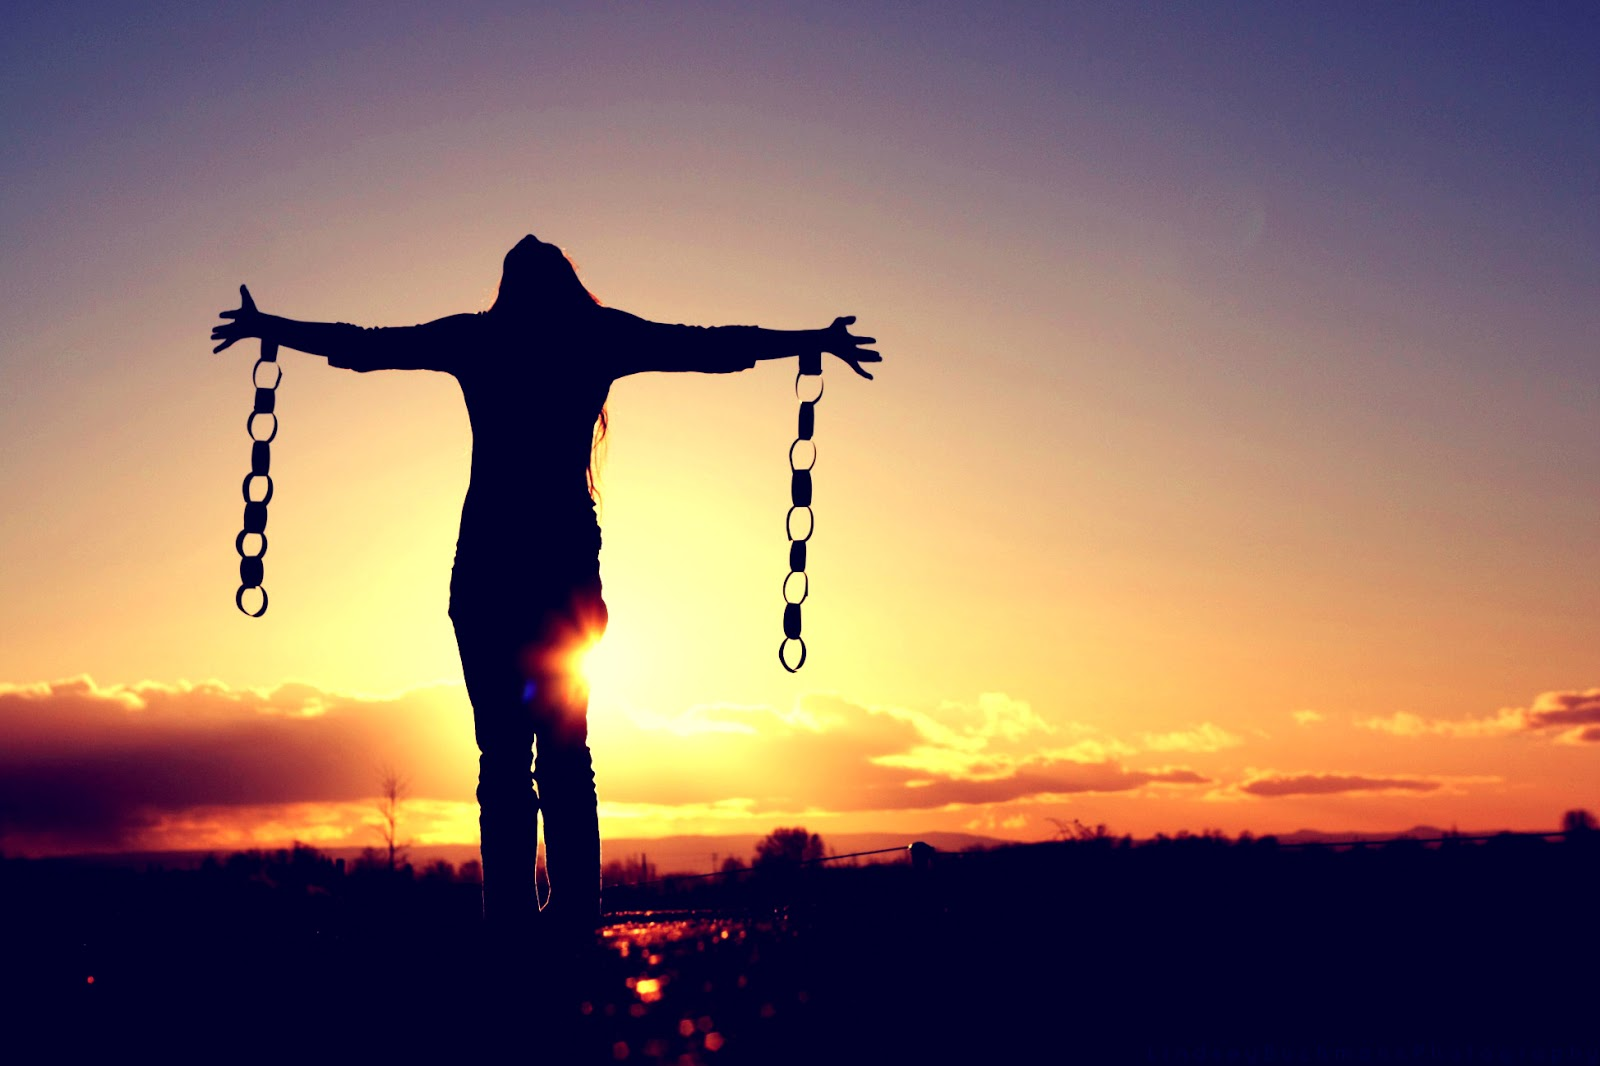 freedom-in-christ.jpg